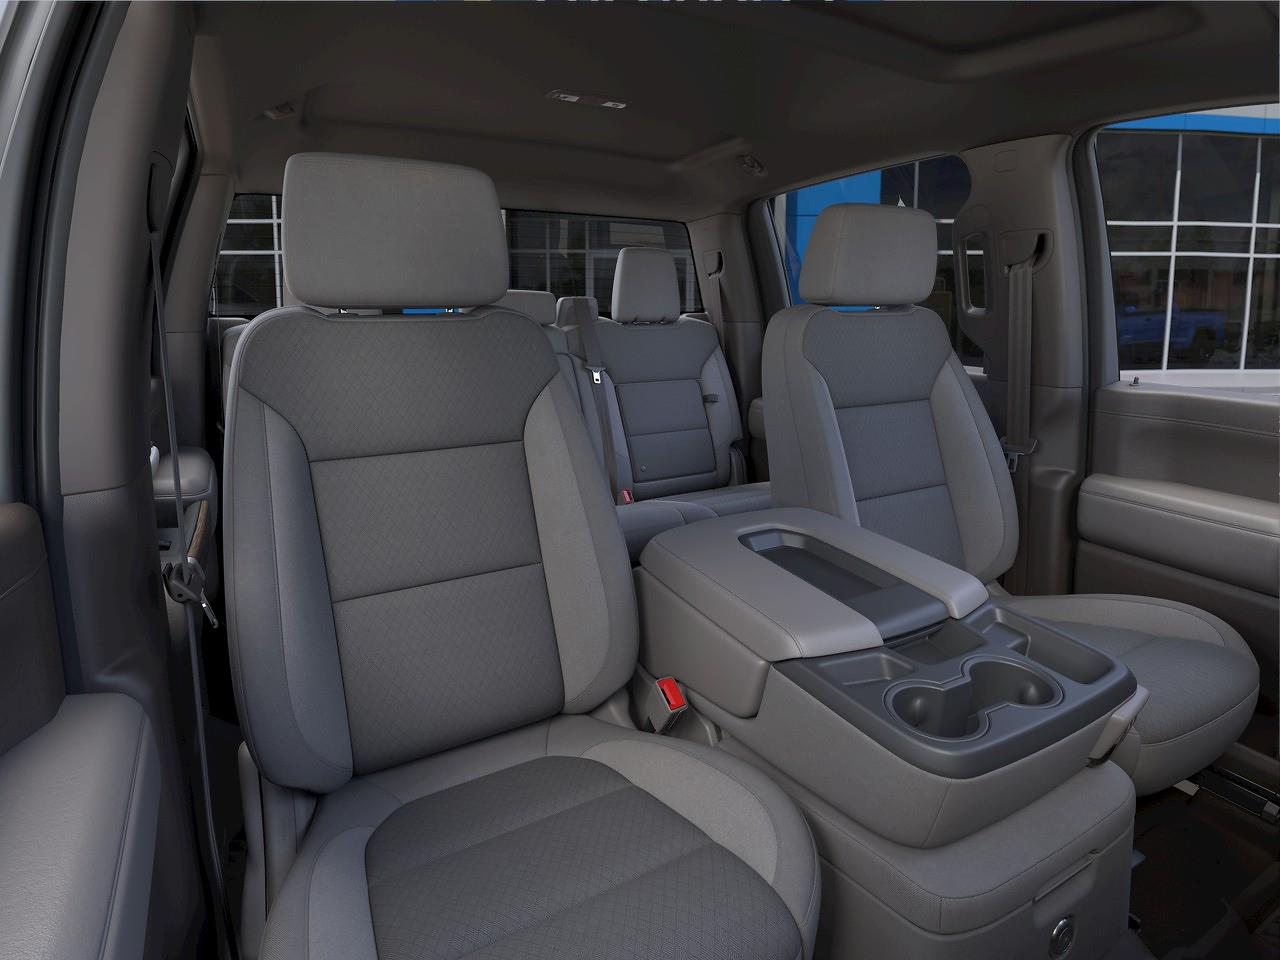 2021 Chevrolet Silverado 3500 Crew Cab 4x4, Pickup #Q210427 - photo 13